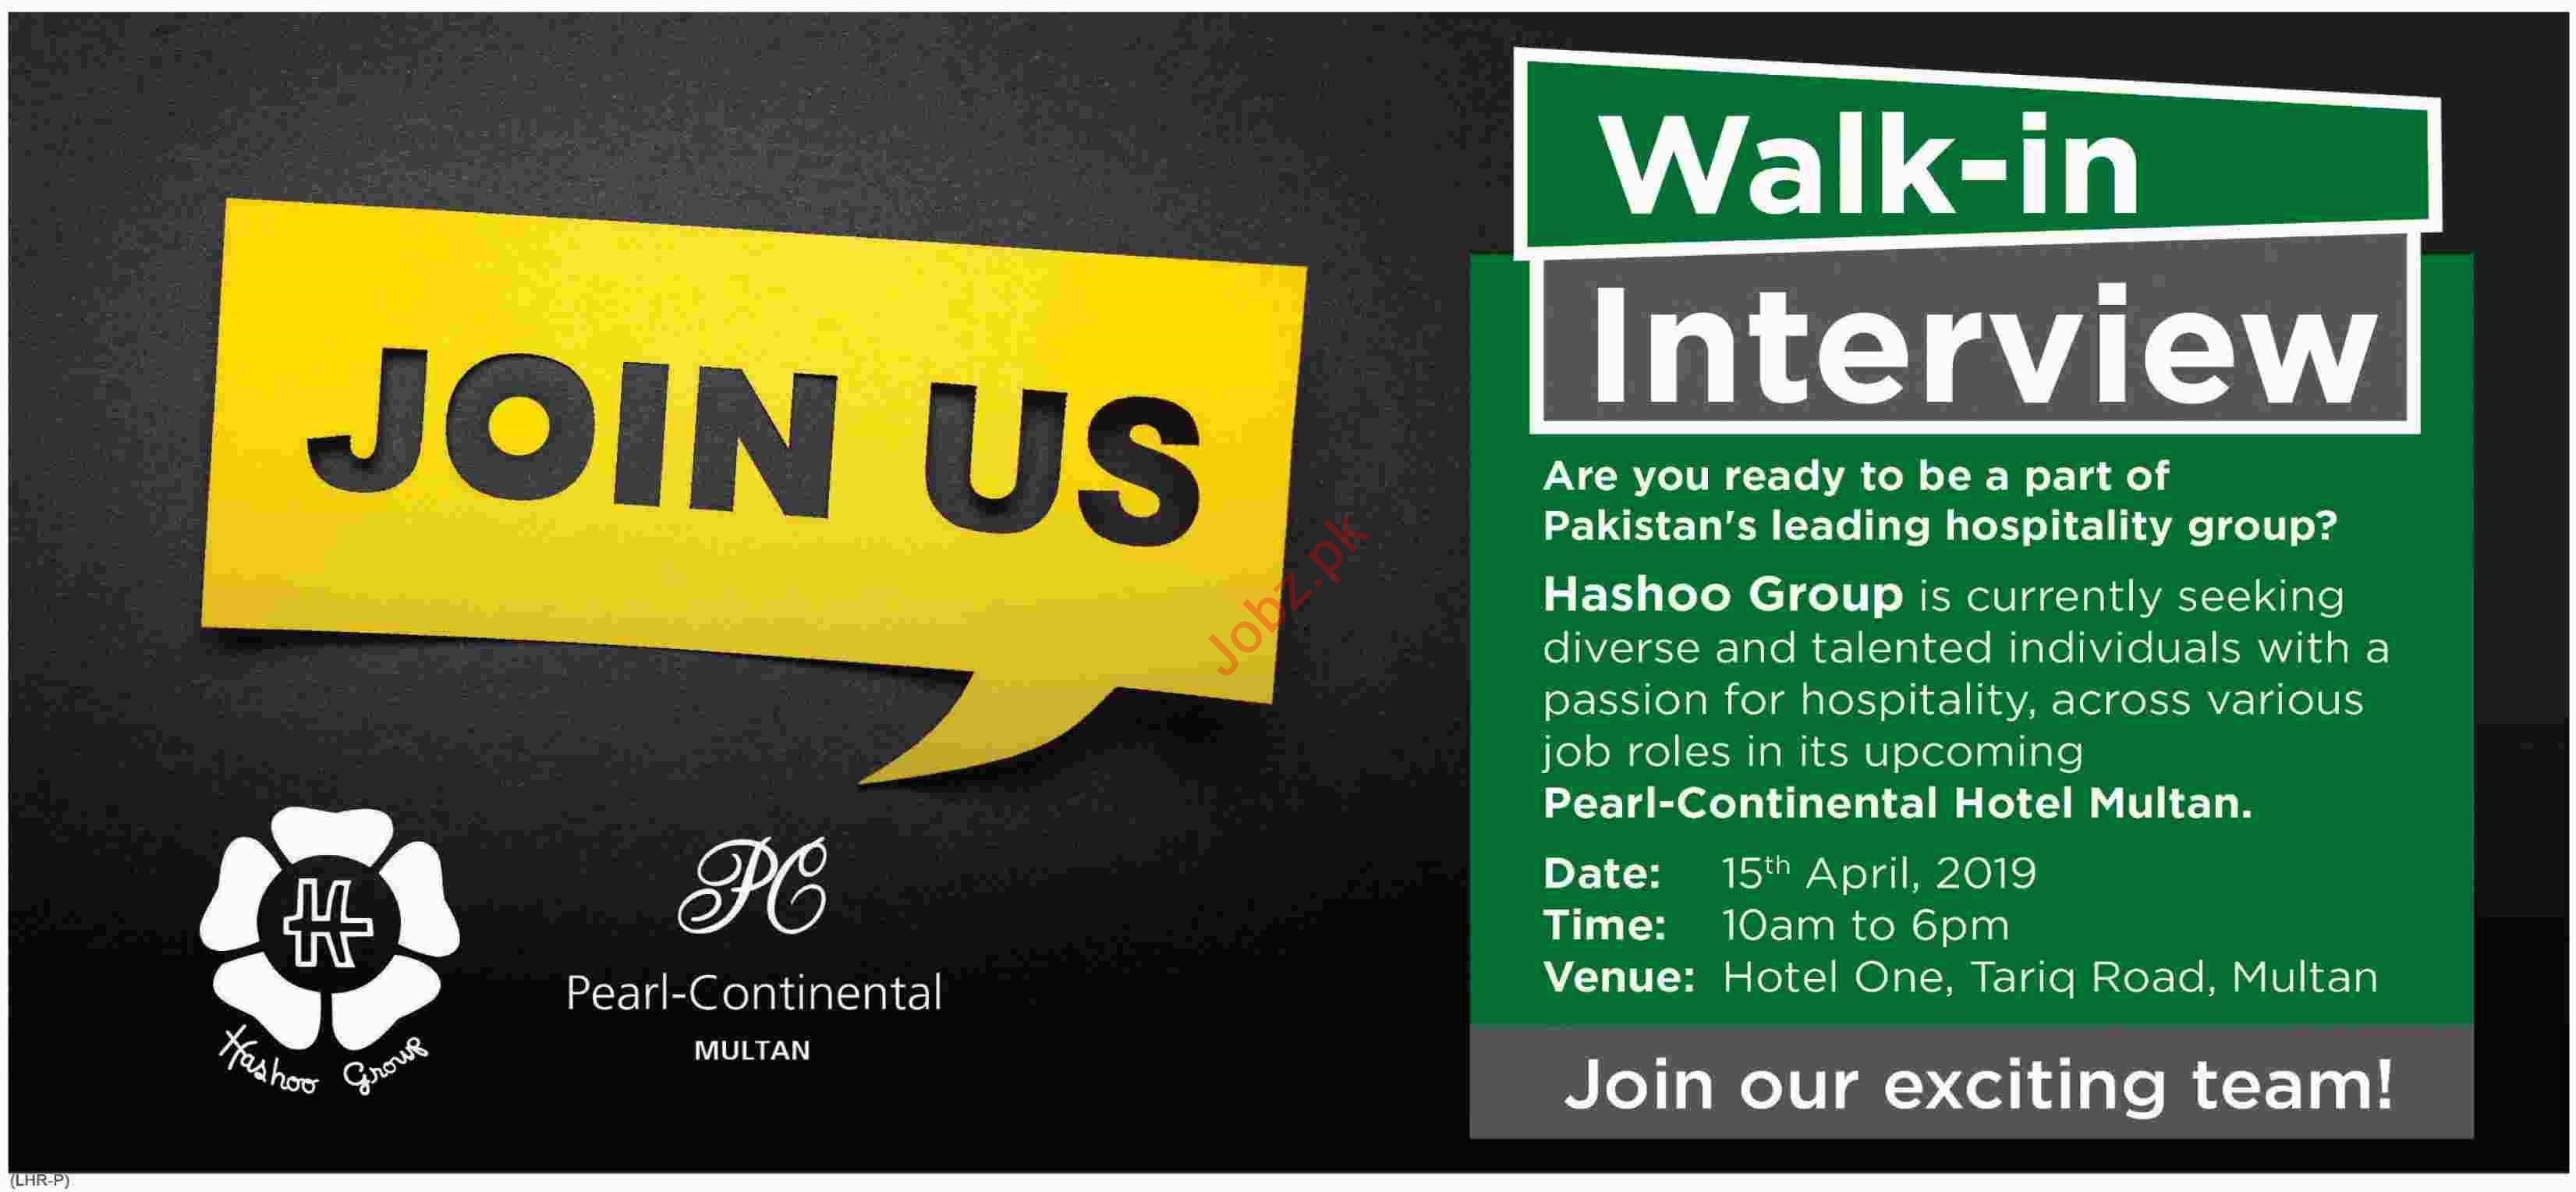 Hashoo Group Management Job in Karachi 2019 Job